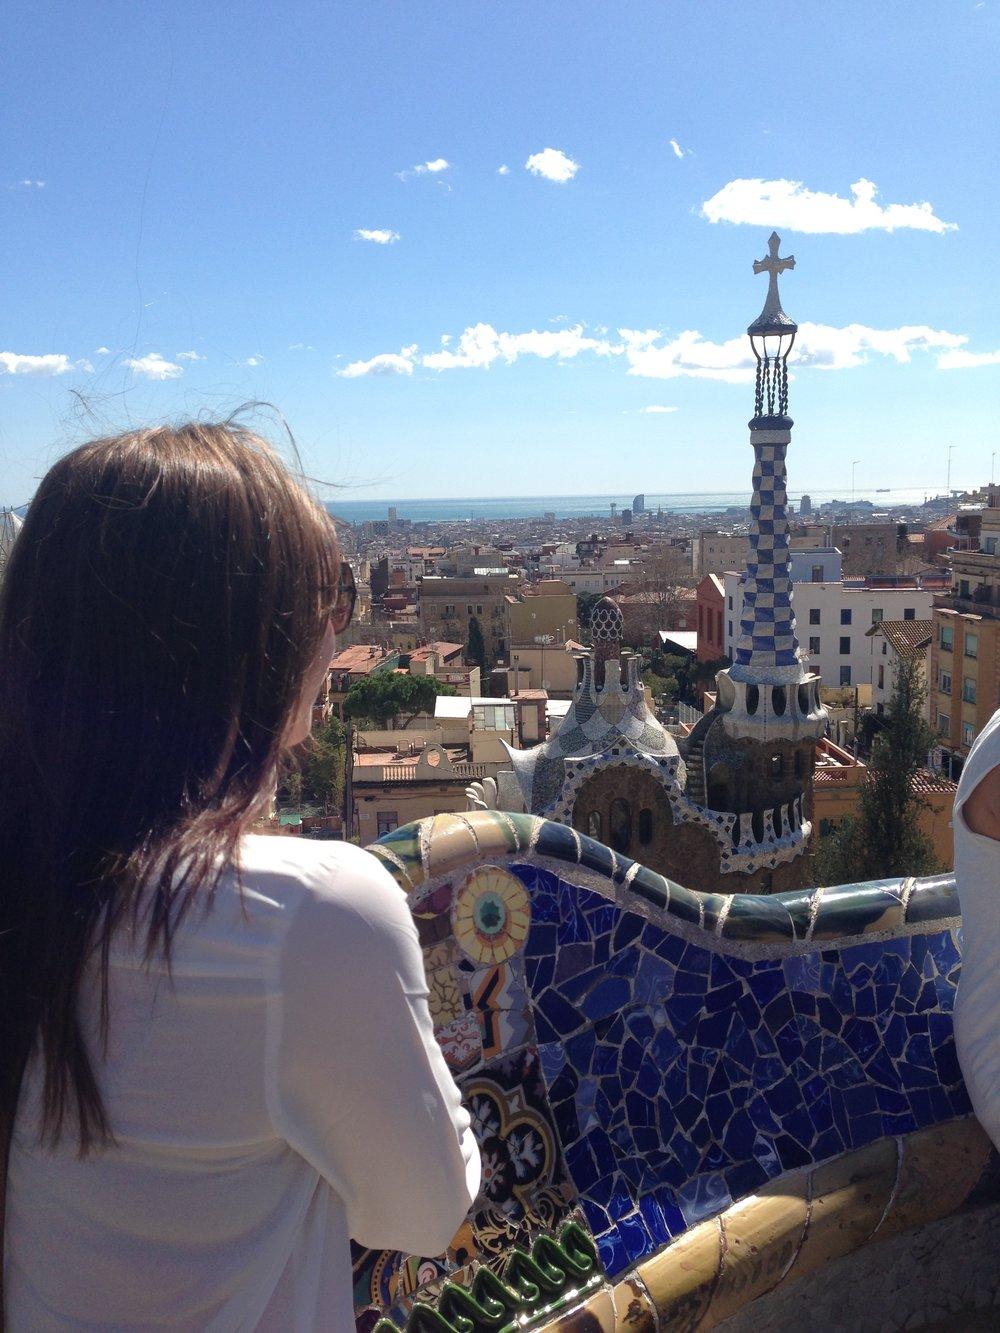 Looking over my favorite city - Barcelona, Spain